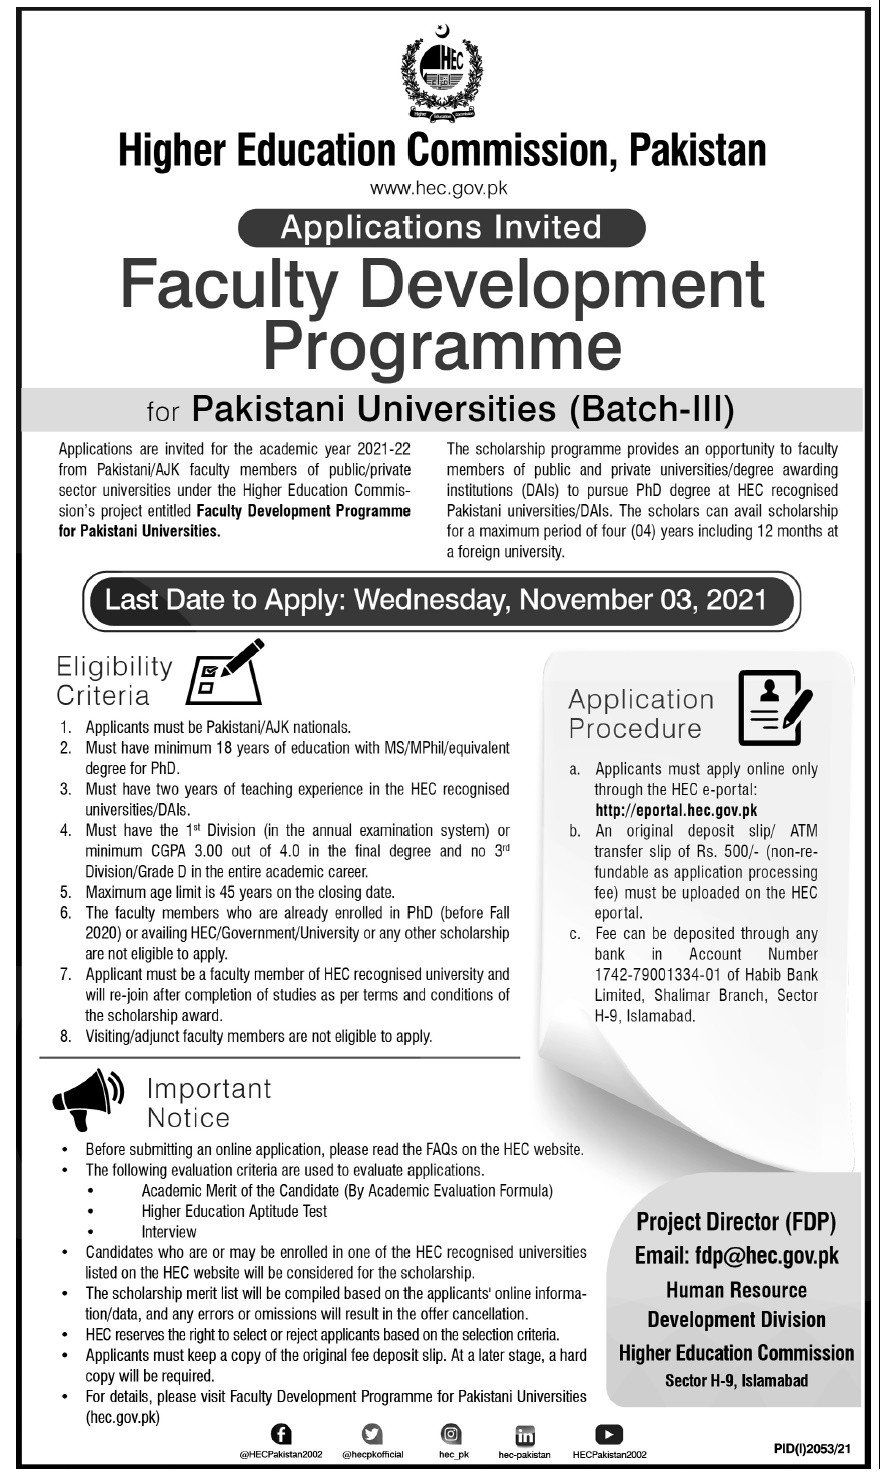 Higher Education Commision Pakistan Islamabad Vacancies 2021 – Latest Jobs 3